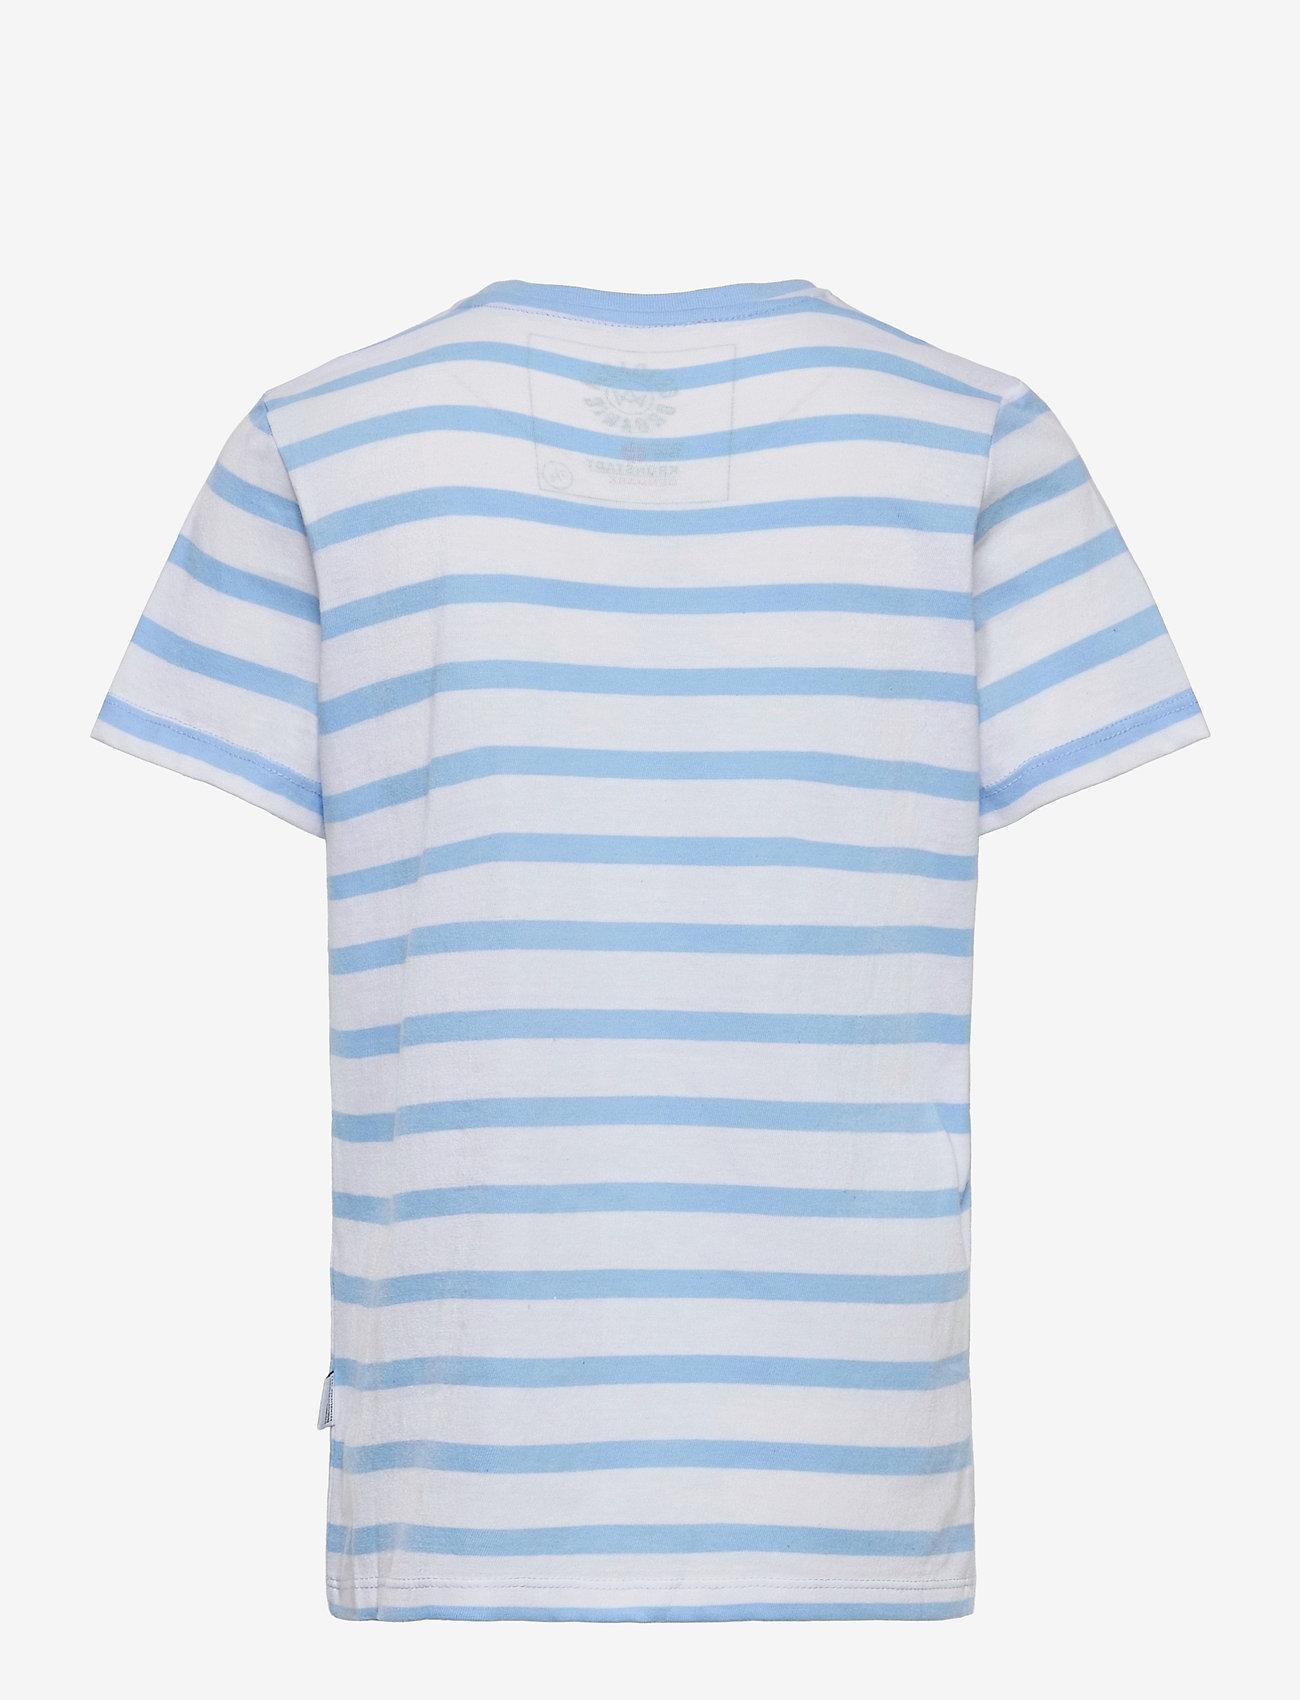 Kronstadt - Navey Recycled - short-sleeved - light blue - 1